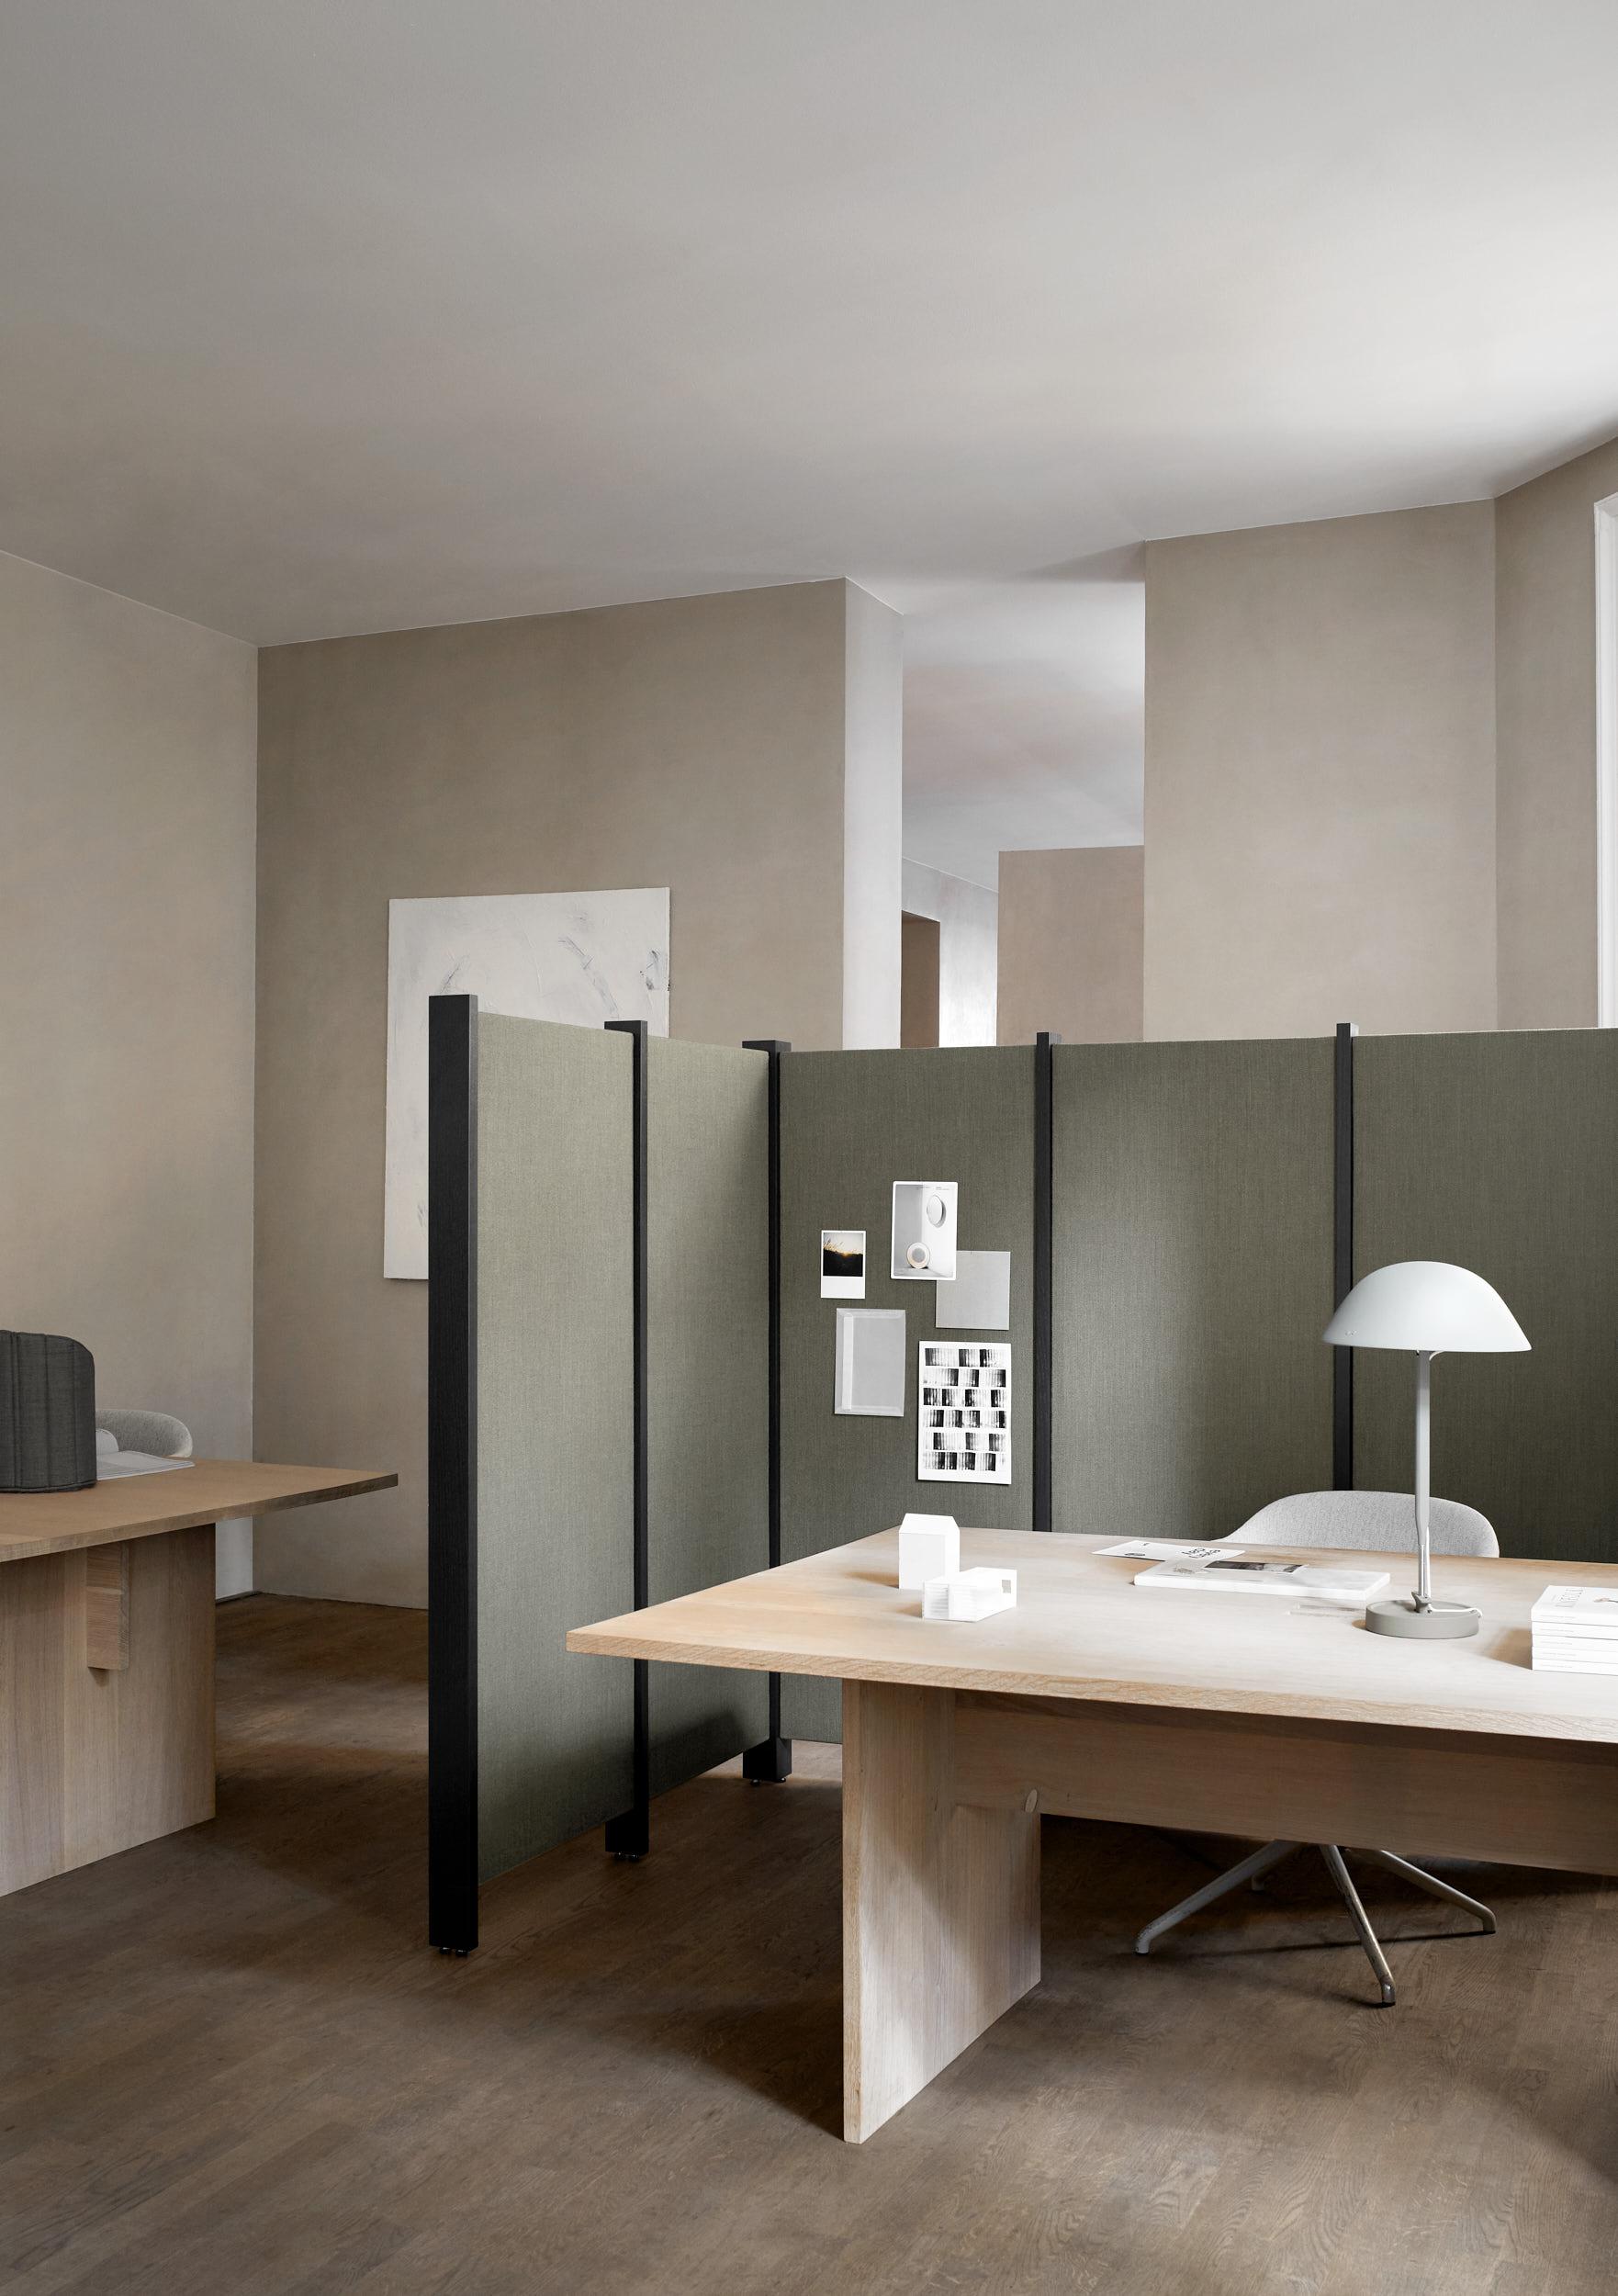 Kyoto : An Architectural Microcosm by Note Design Studio on Anniversary Magazine